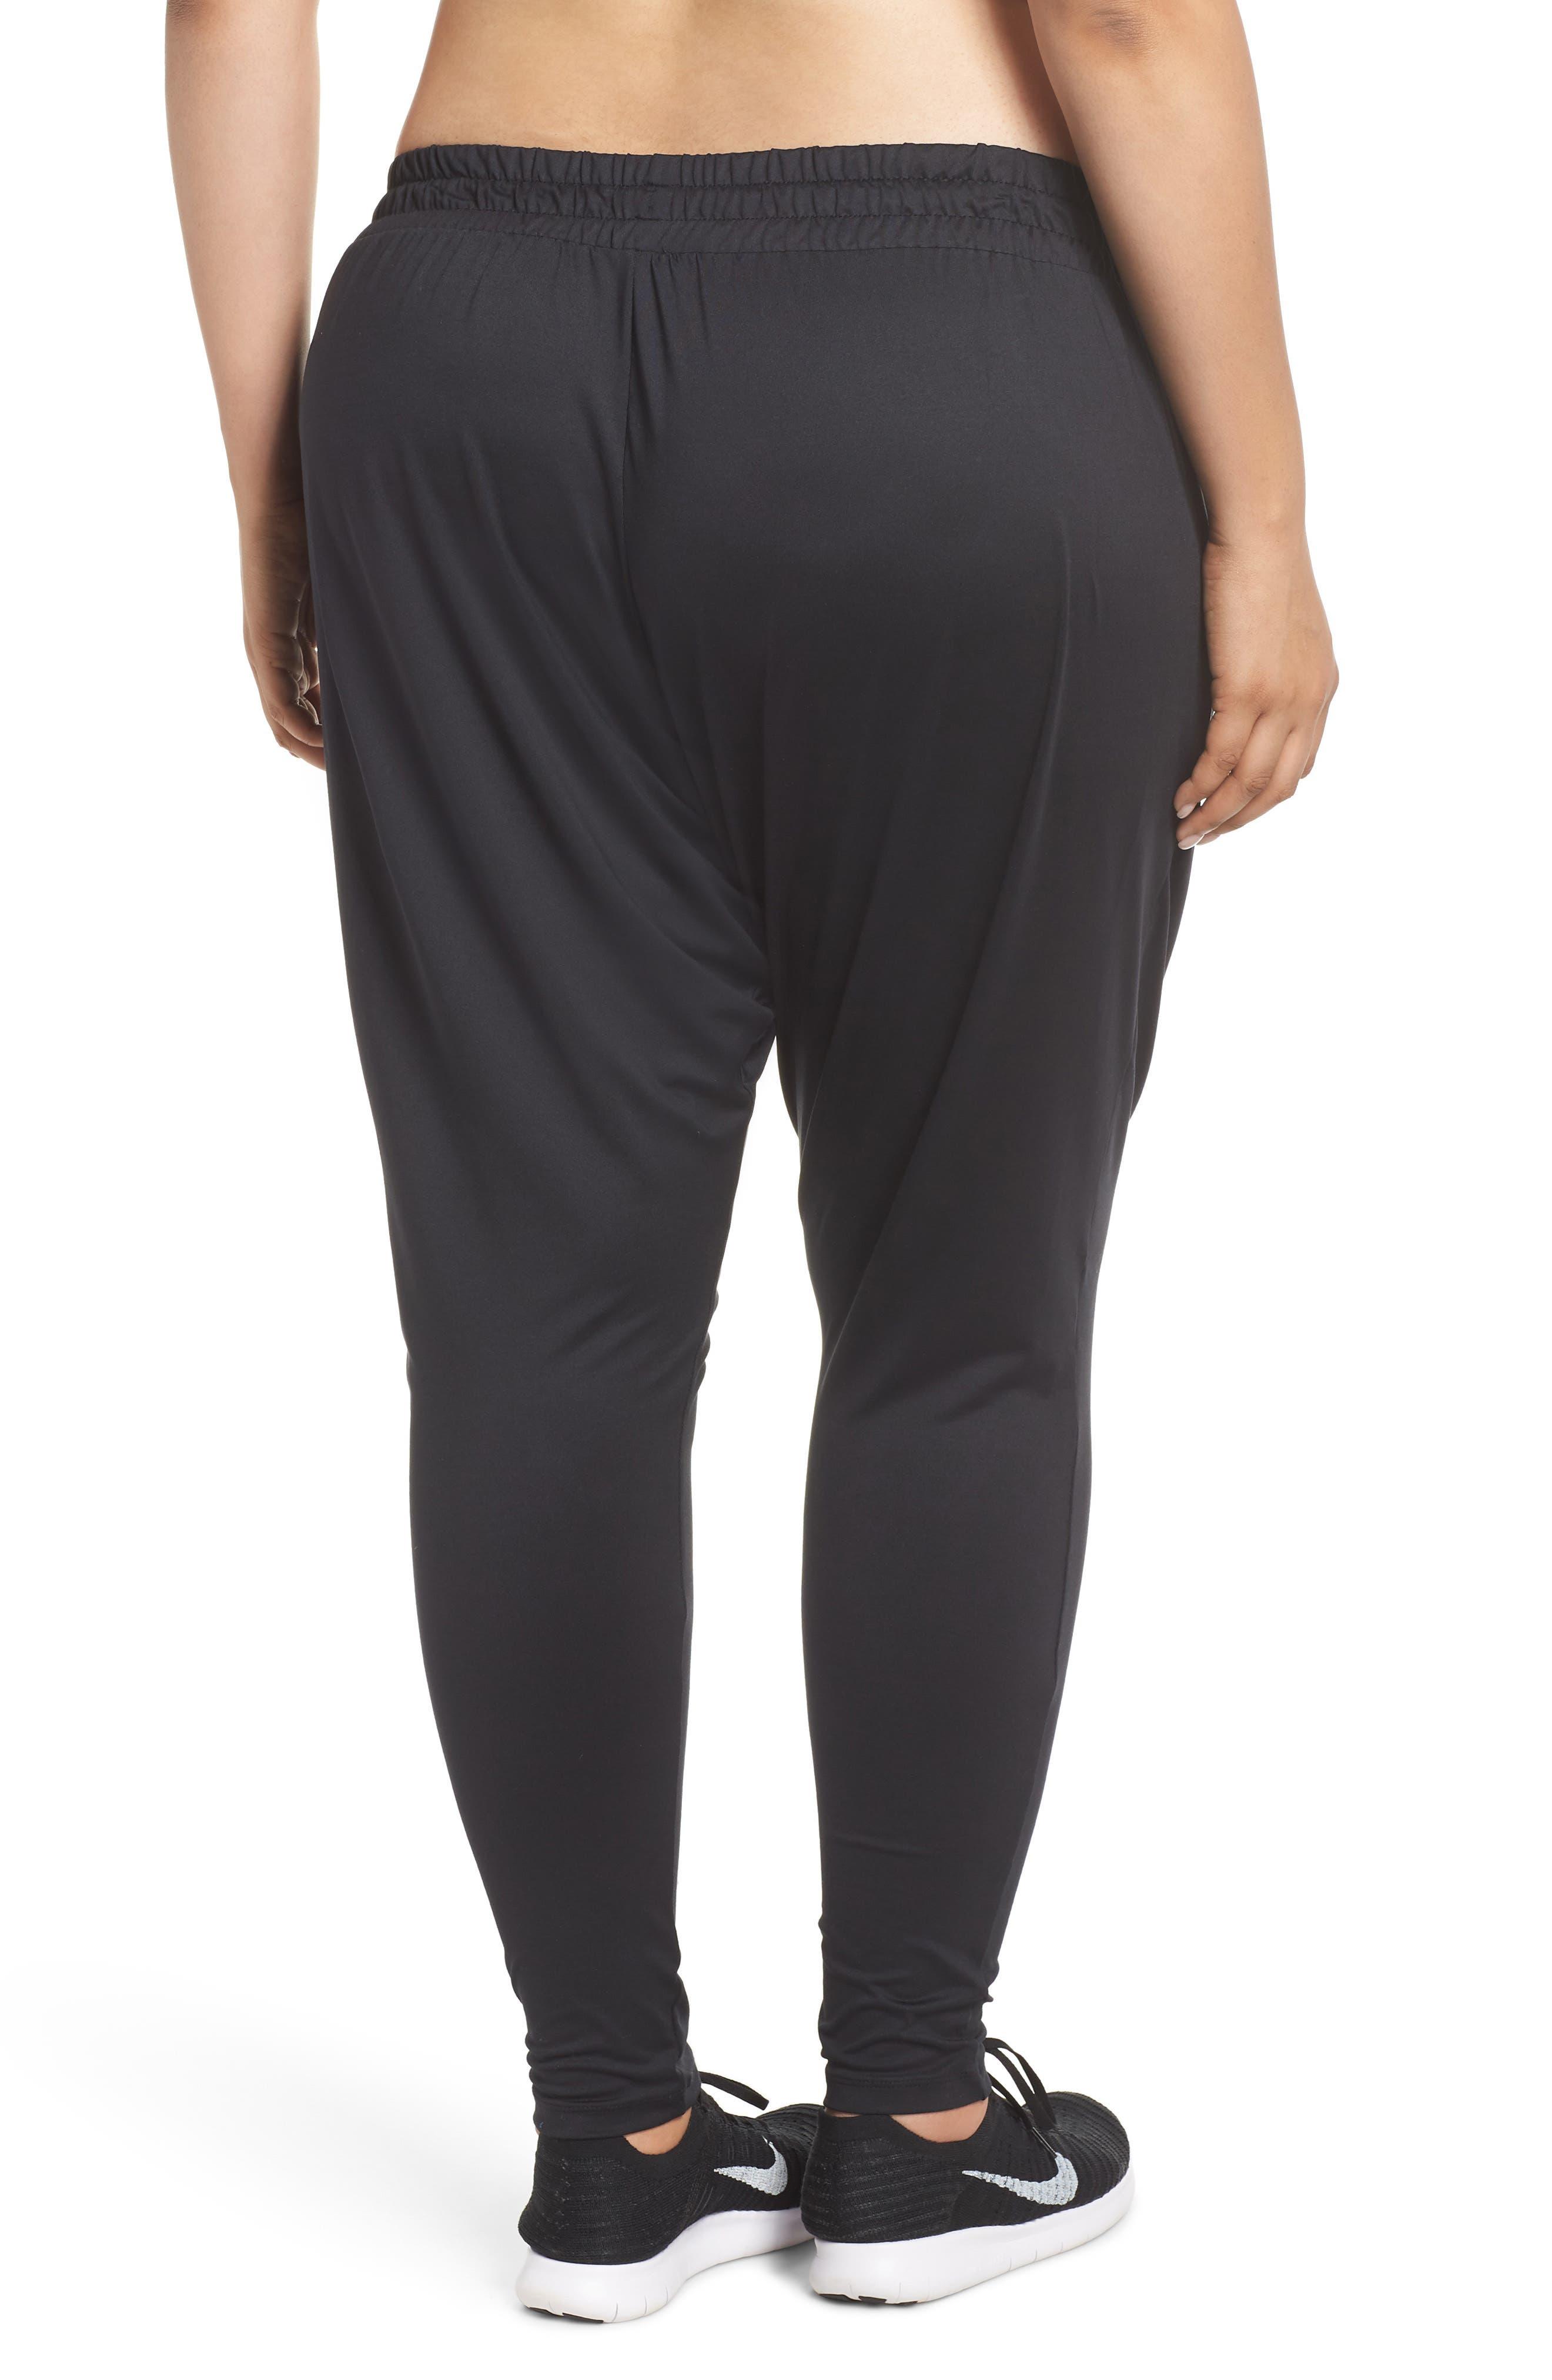 Dry Lux Flow Training Pants,                             Alternate thumbnail 2, color,                             Black/ Clear